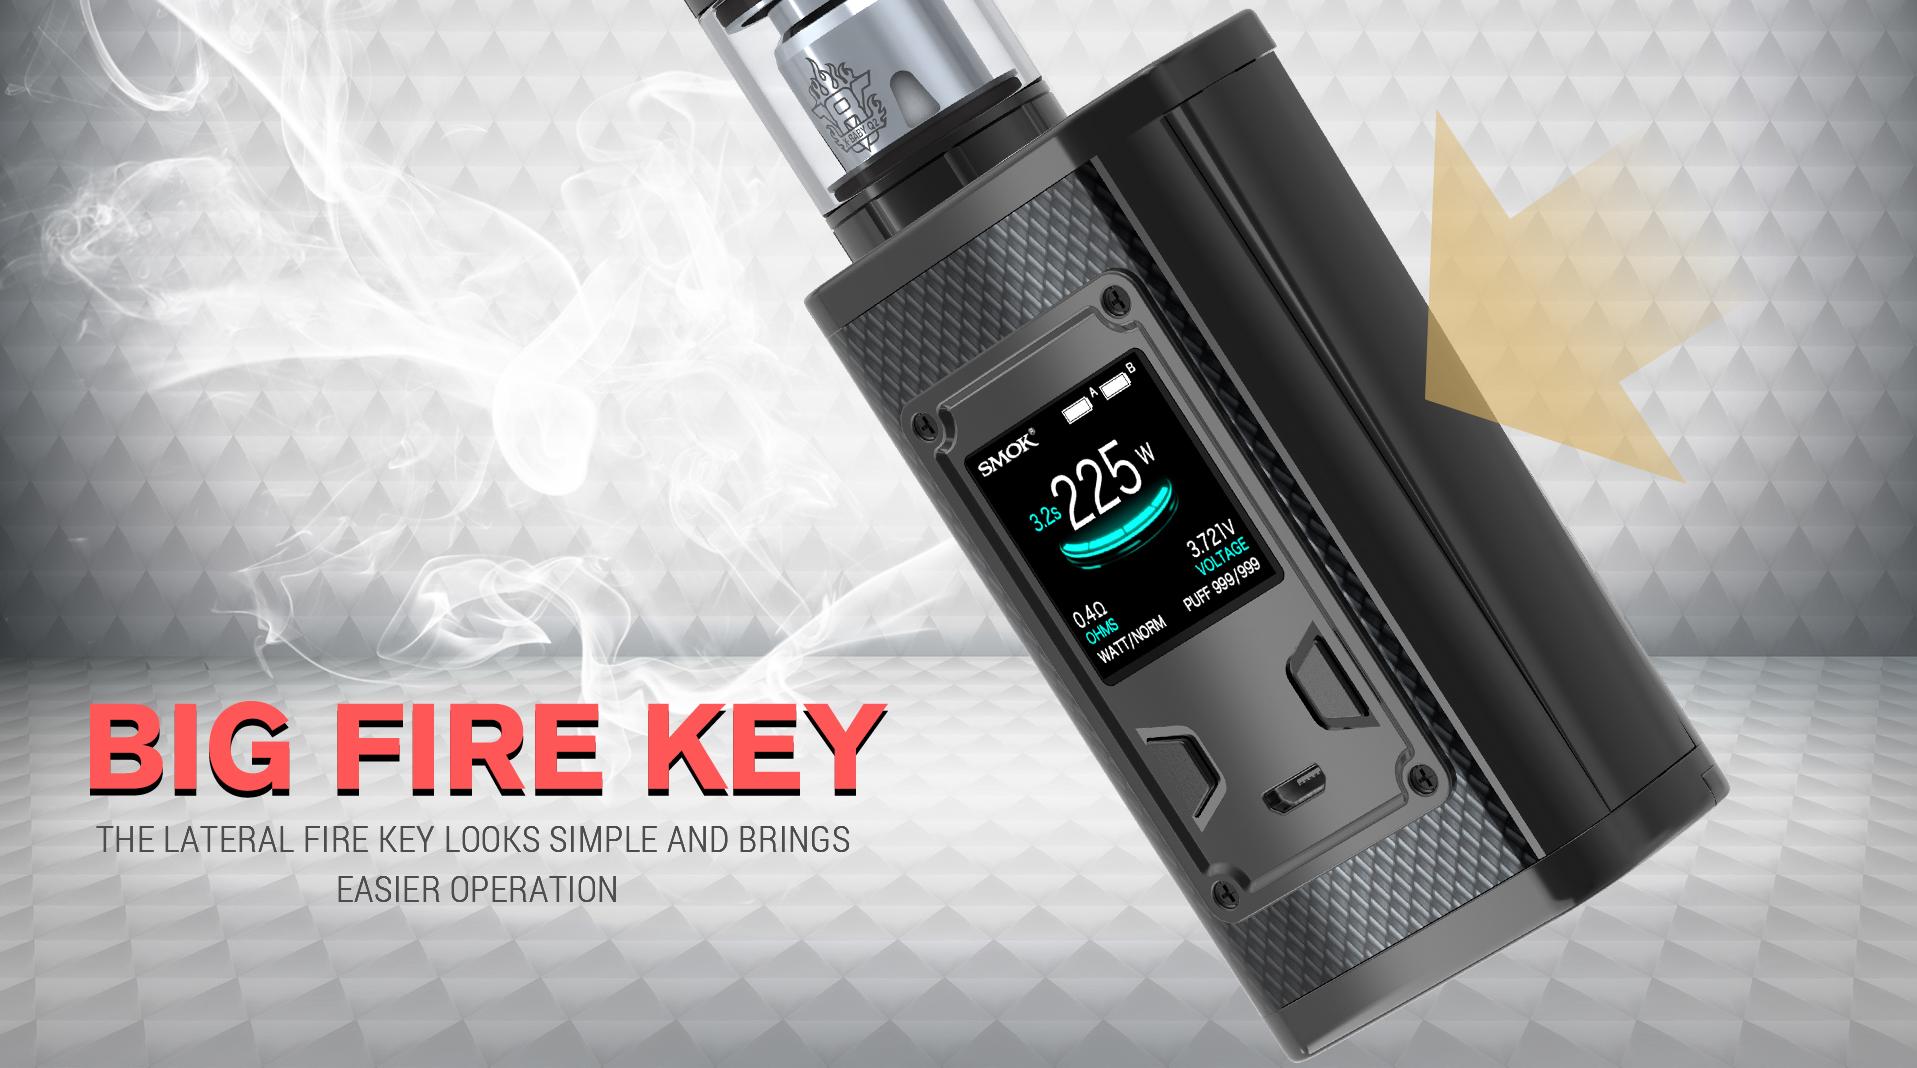 Smok Majesty e-sigarett